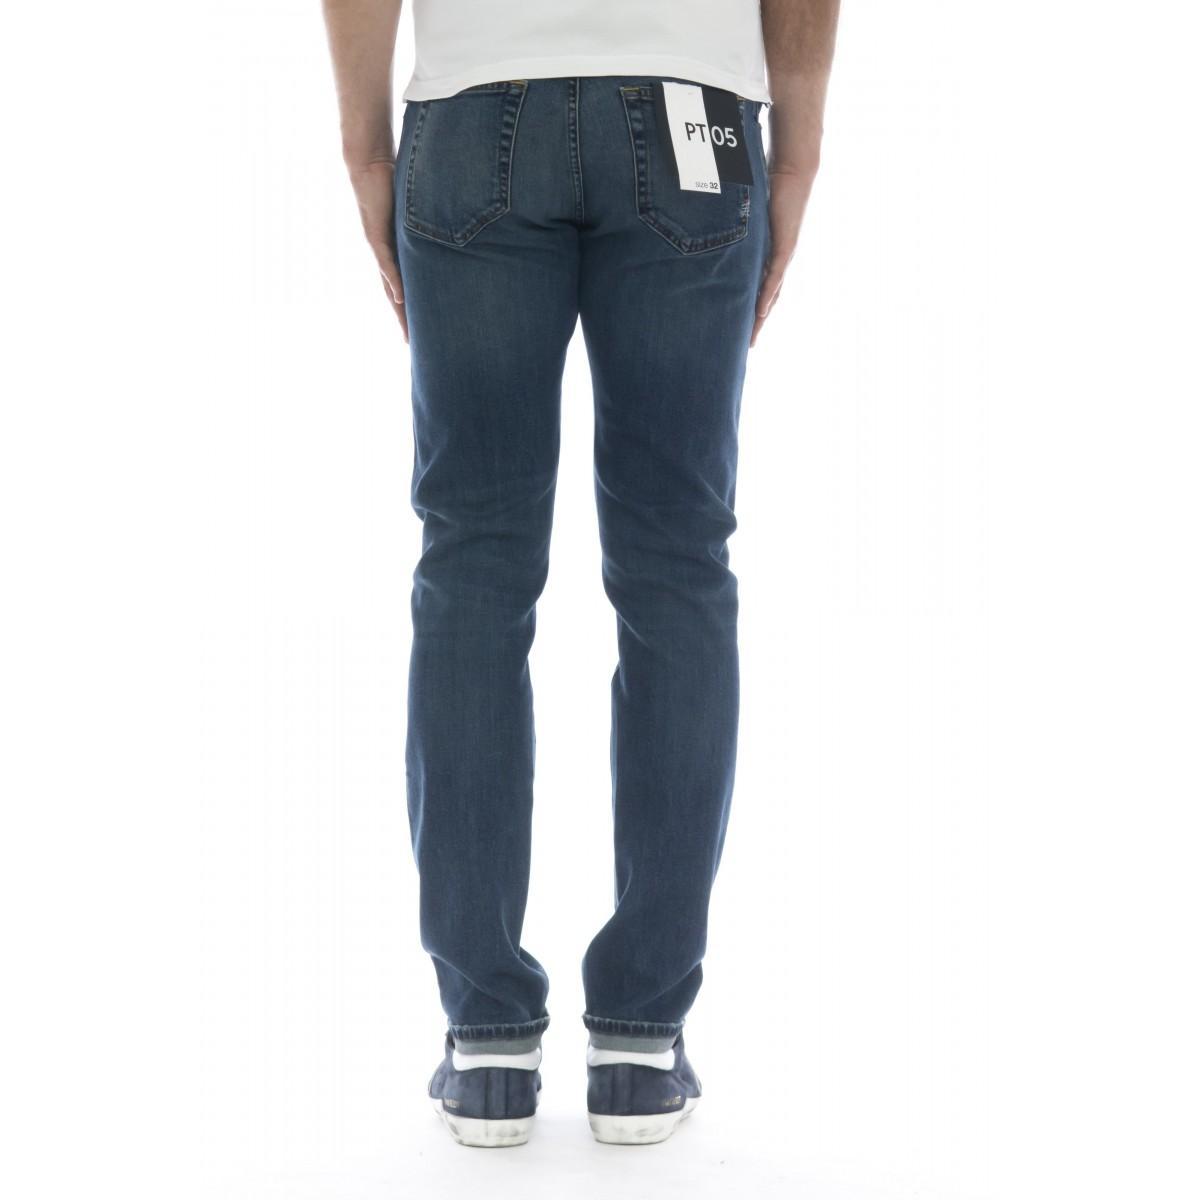 Jeans - Soul ku07 jeansslim